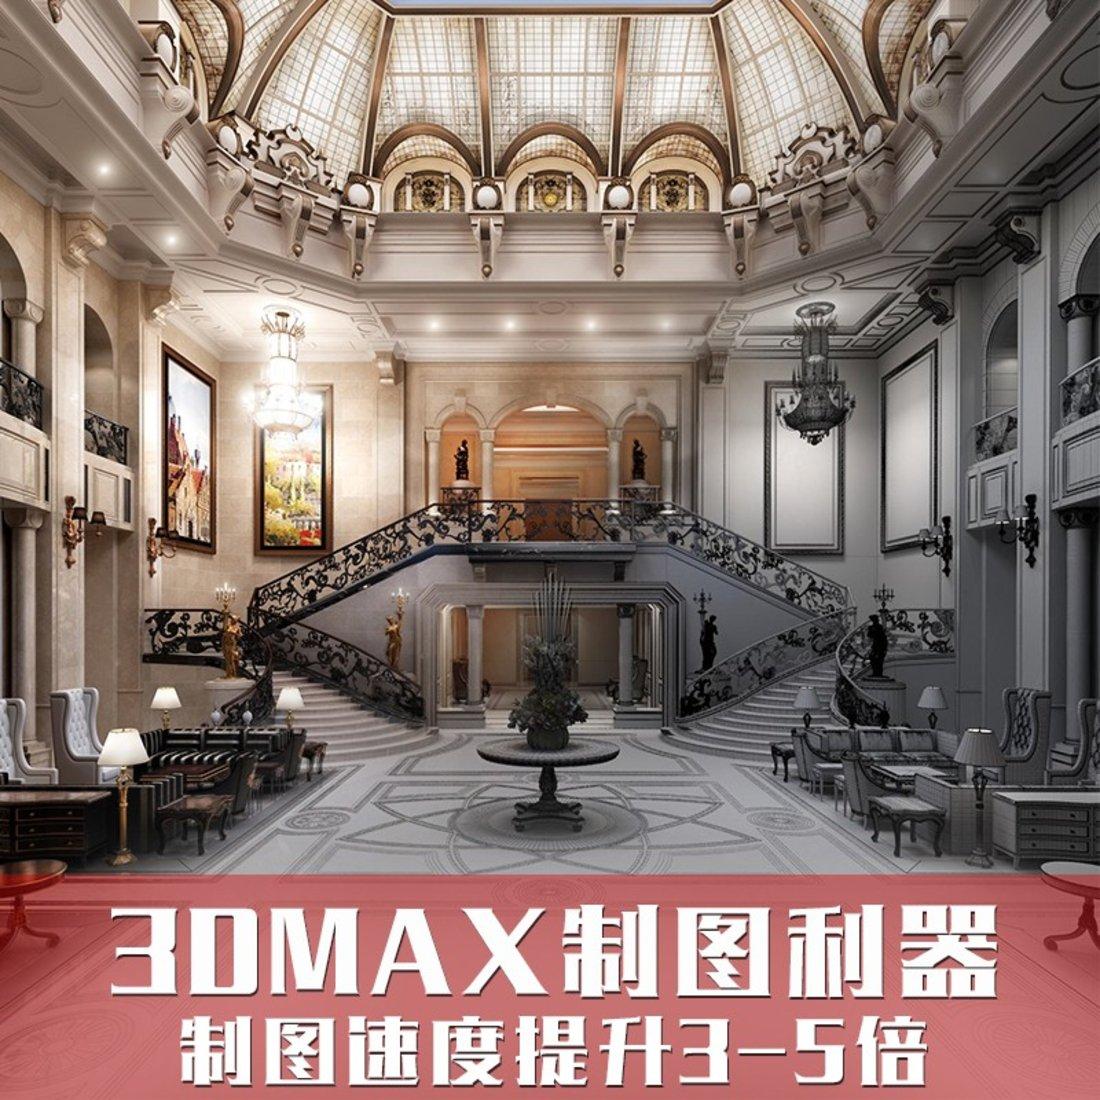 《3DMAX效果图大师》